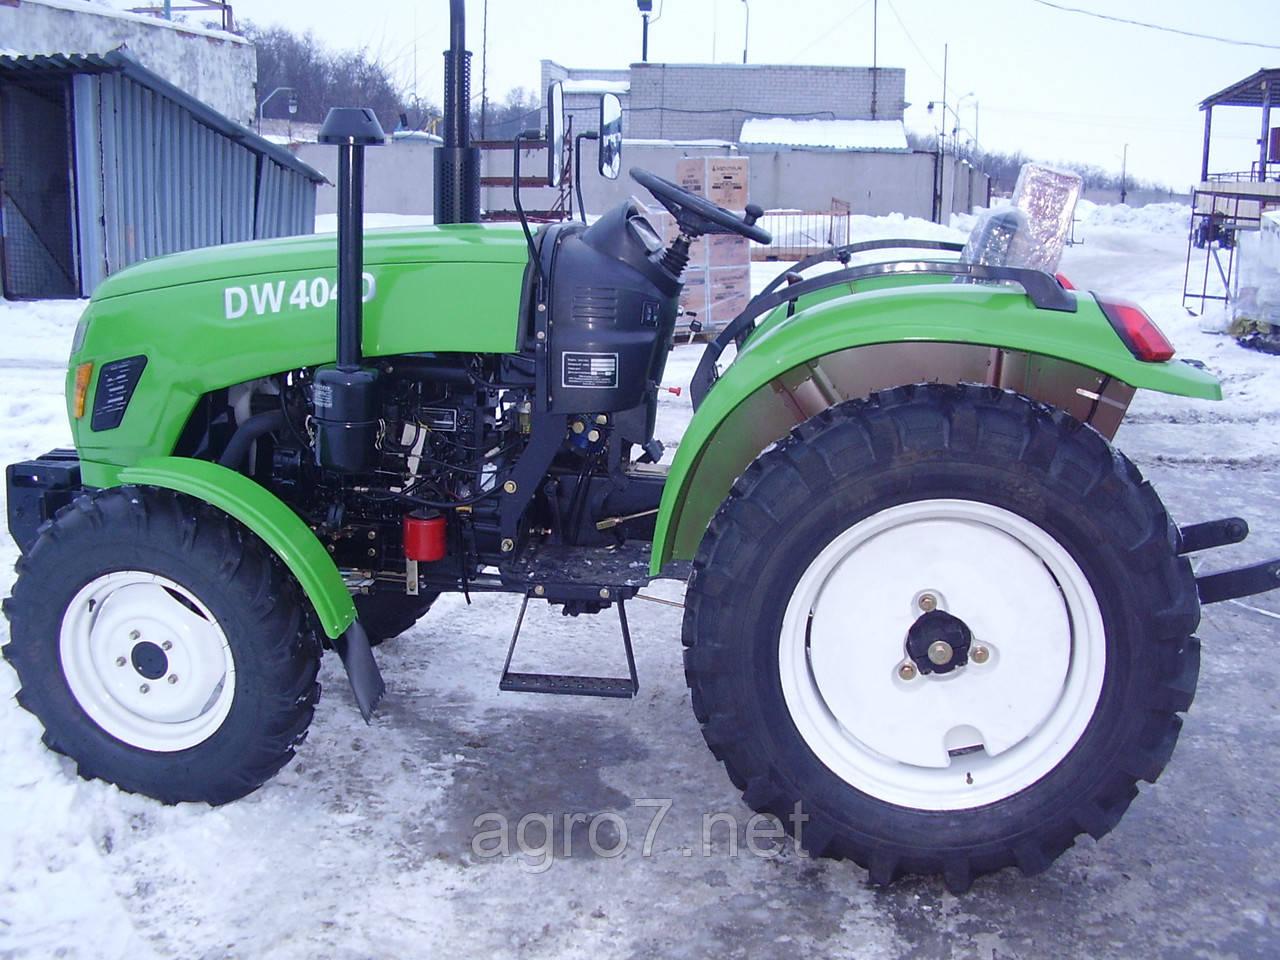 Трактор с доставкой DW 404DR (40л.с., 4х4, 4 цил, реверс)